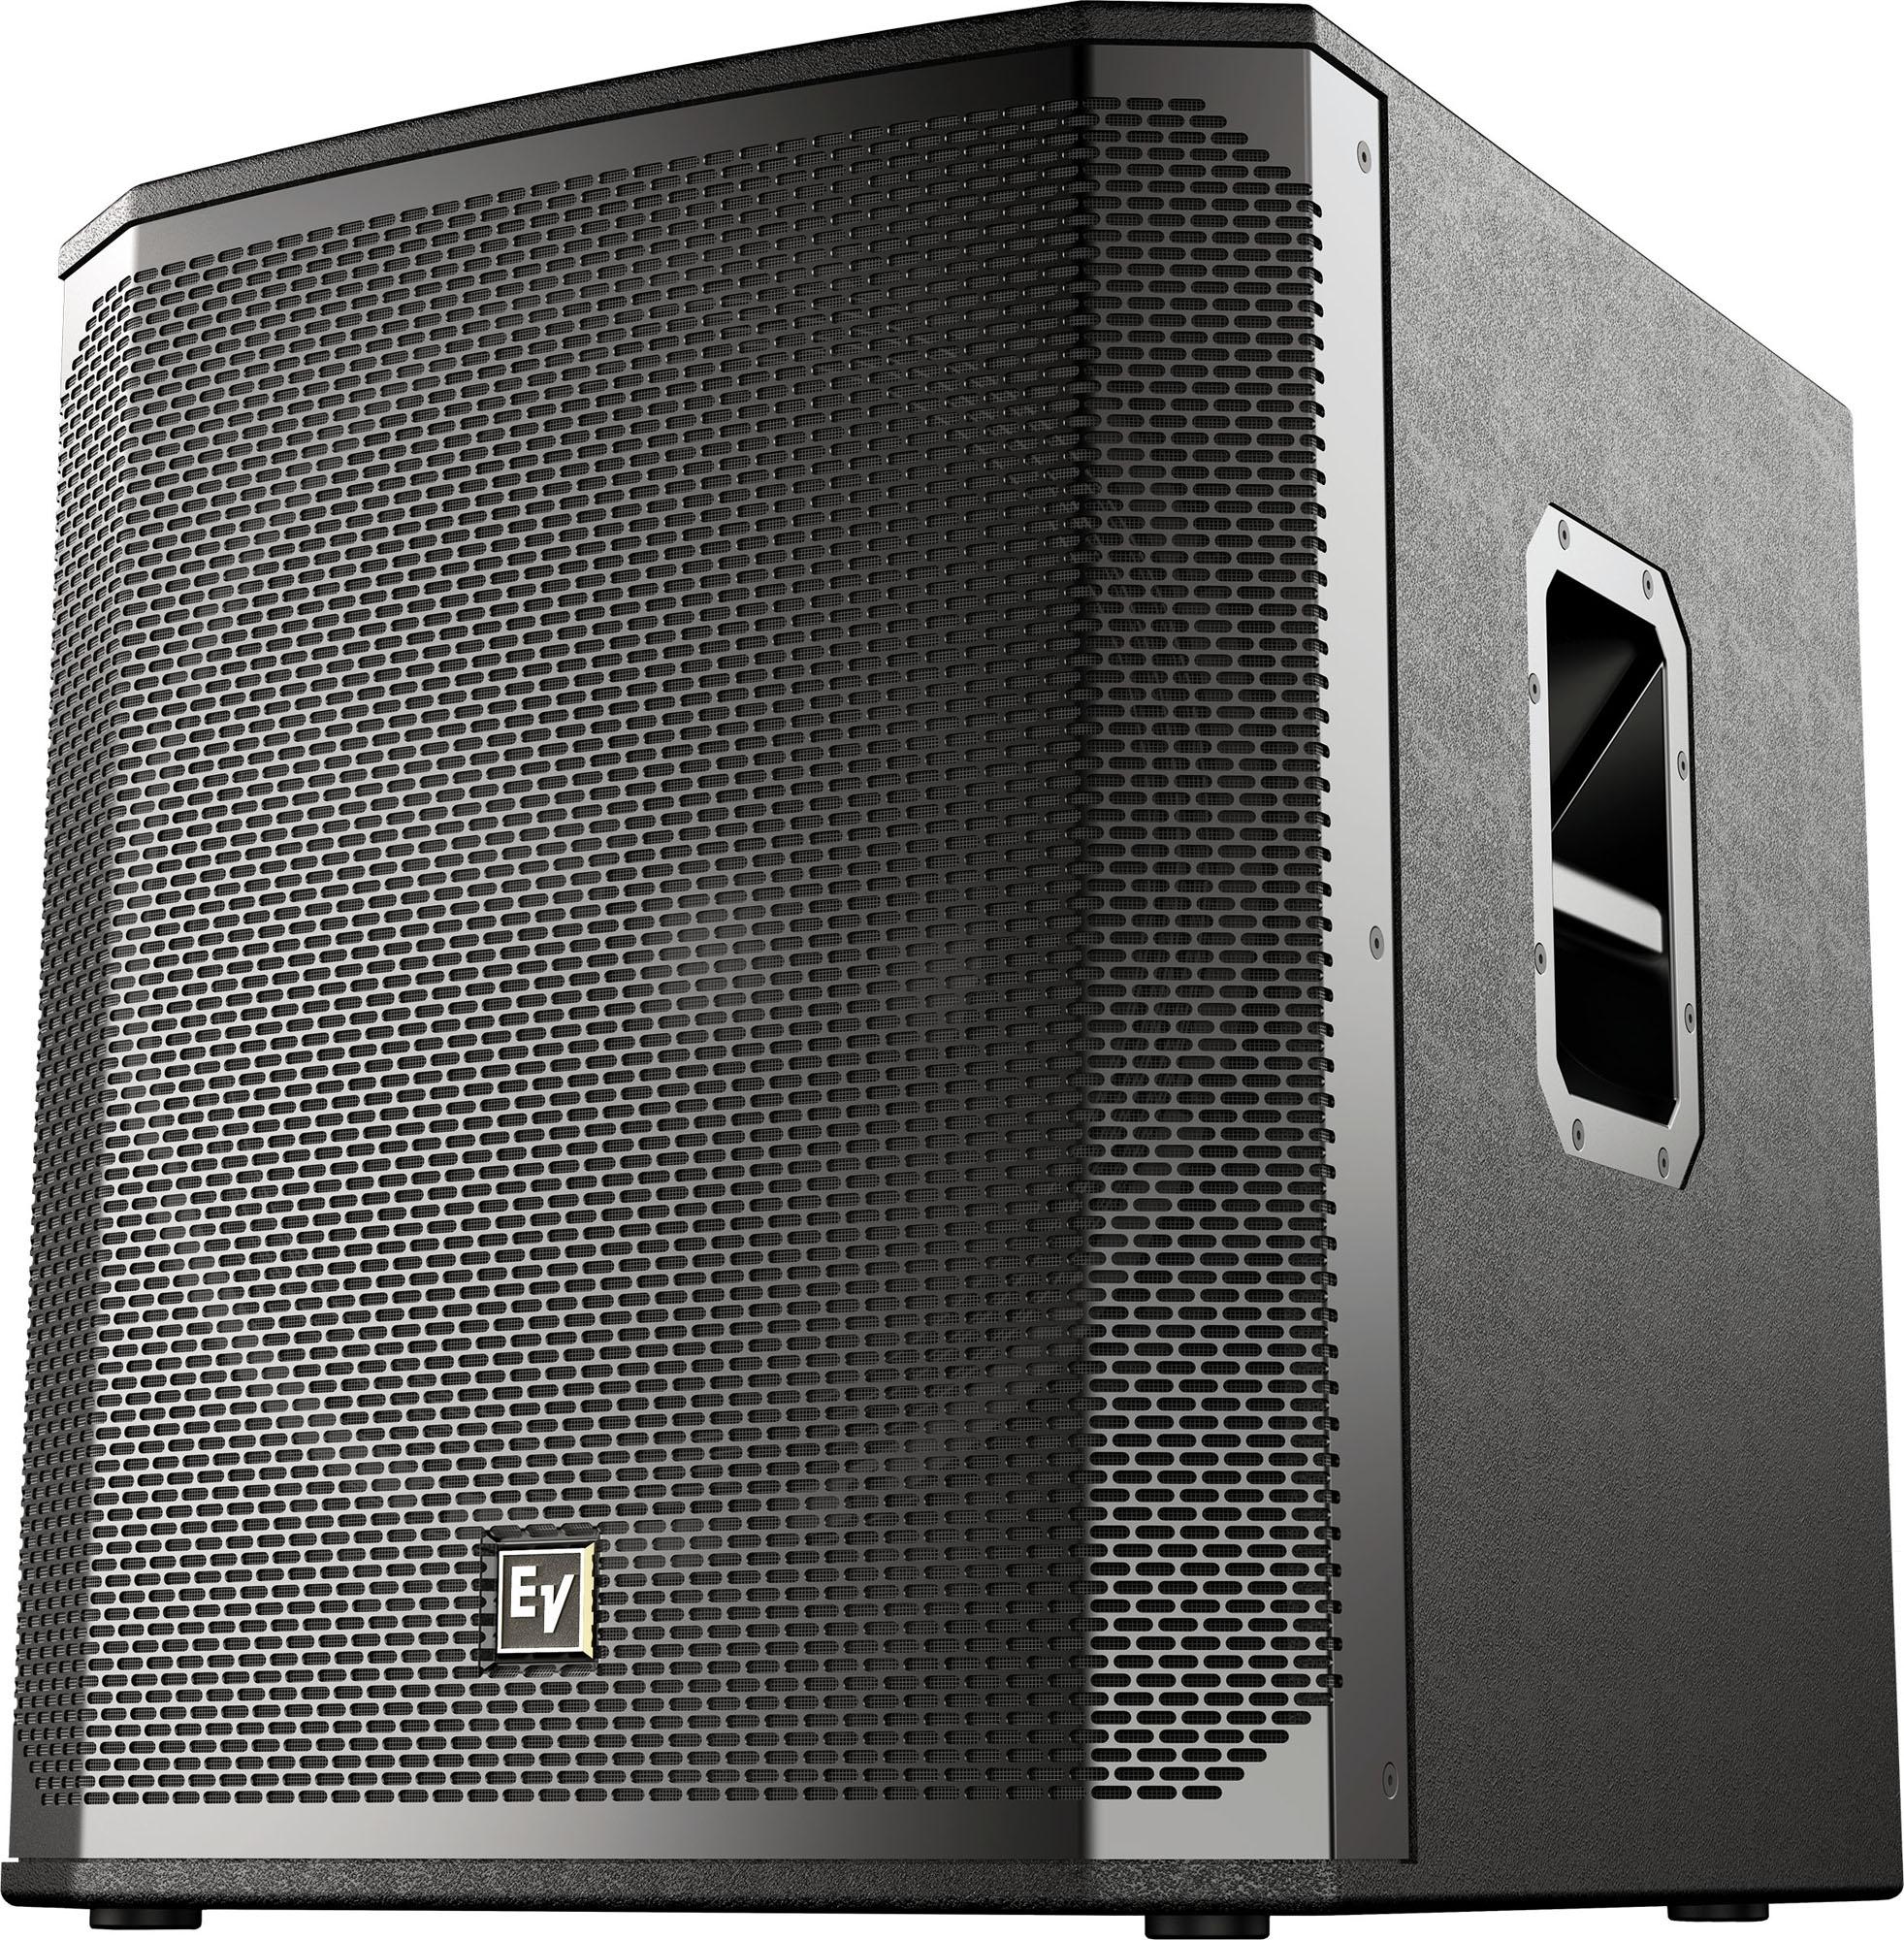 Electro-Voice ELX200-18s - ساب ووفر اکتیو و پسیو حرفه ای